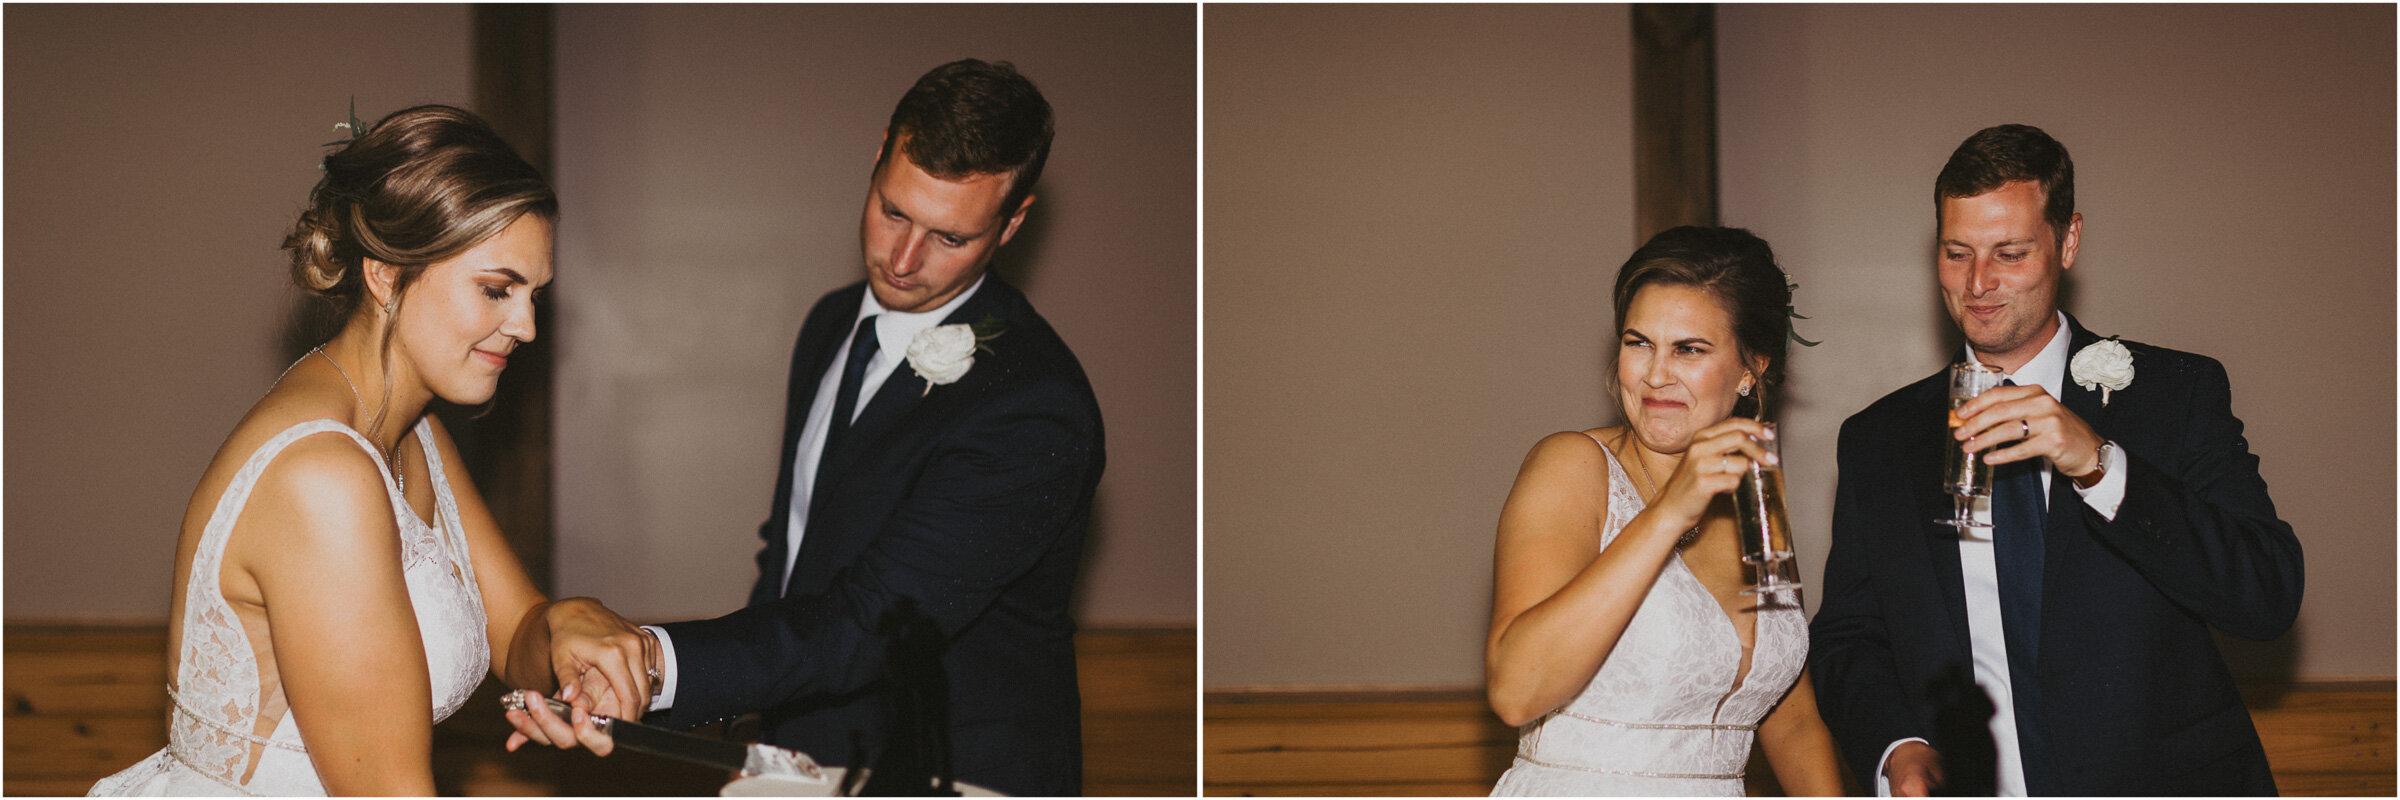 alyssa barletter photography summer wedding photographer powell gardens-34.jpg